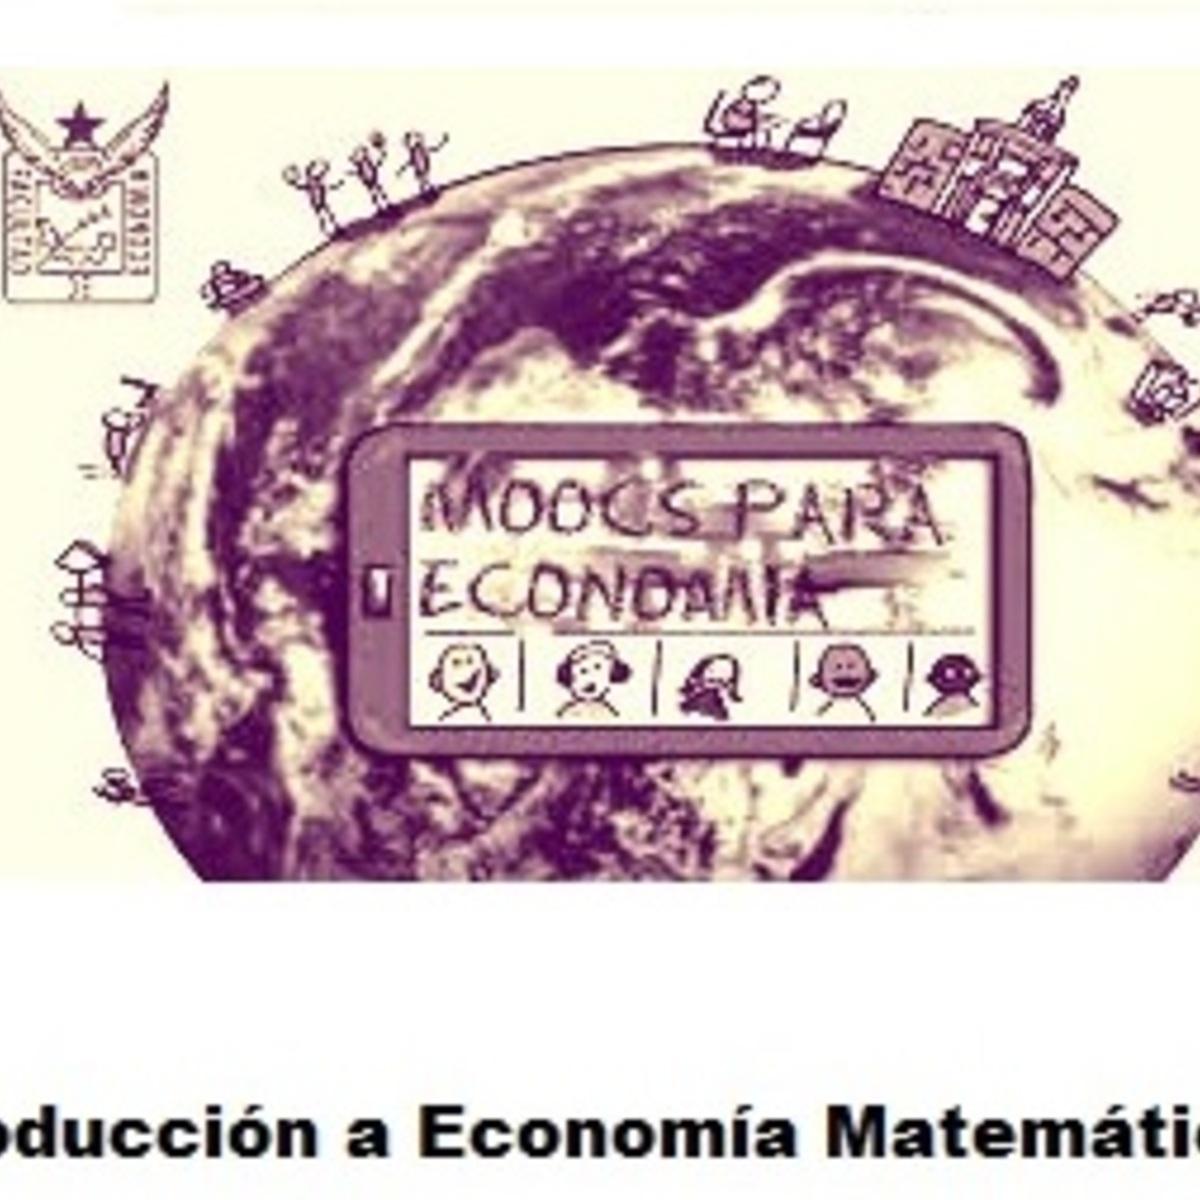 Introducción a Economía Matemática 1 course image